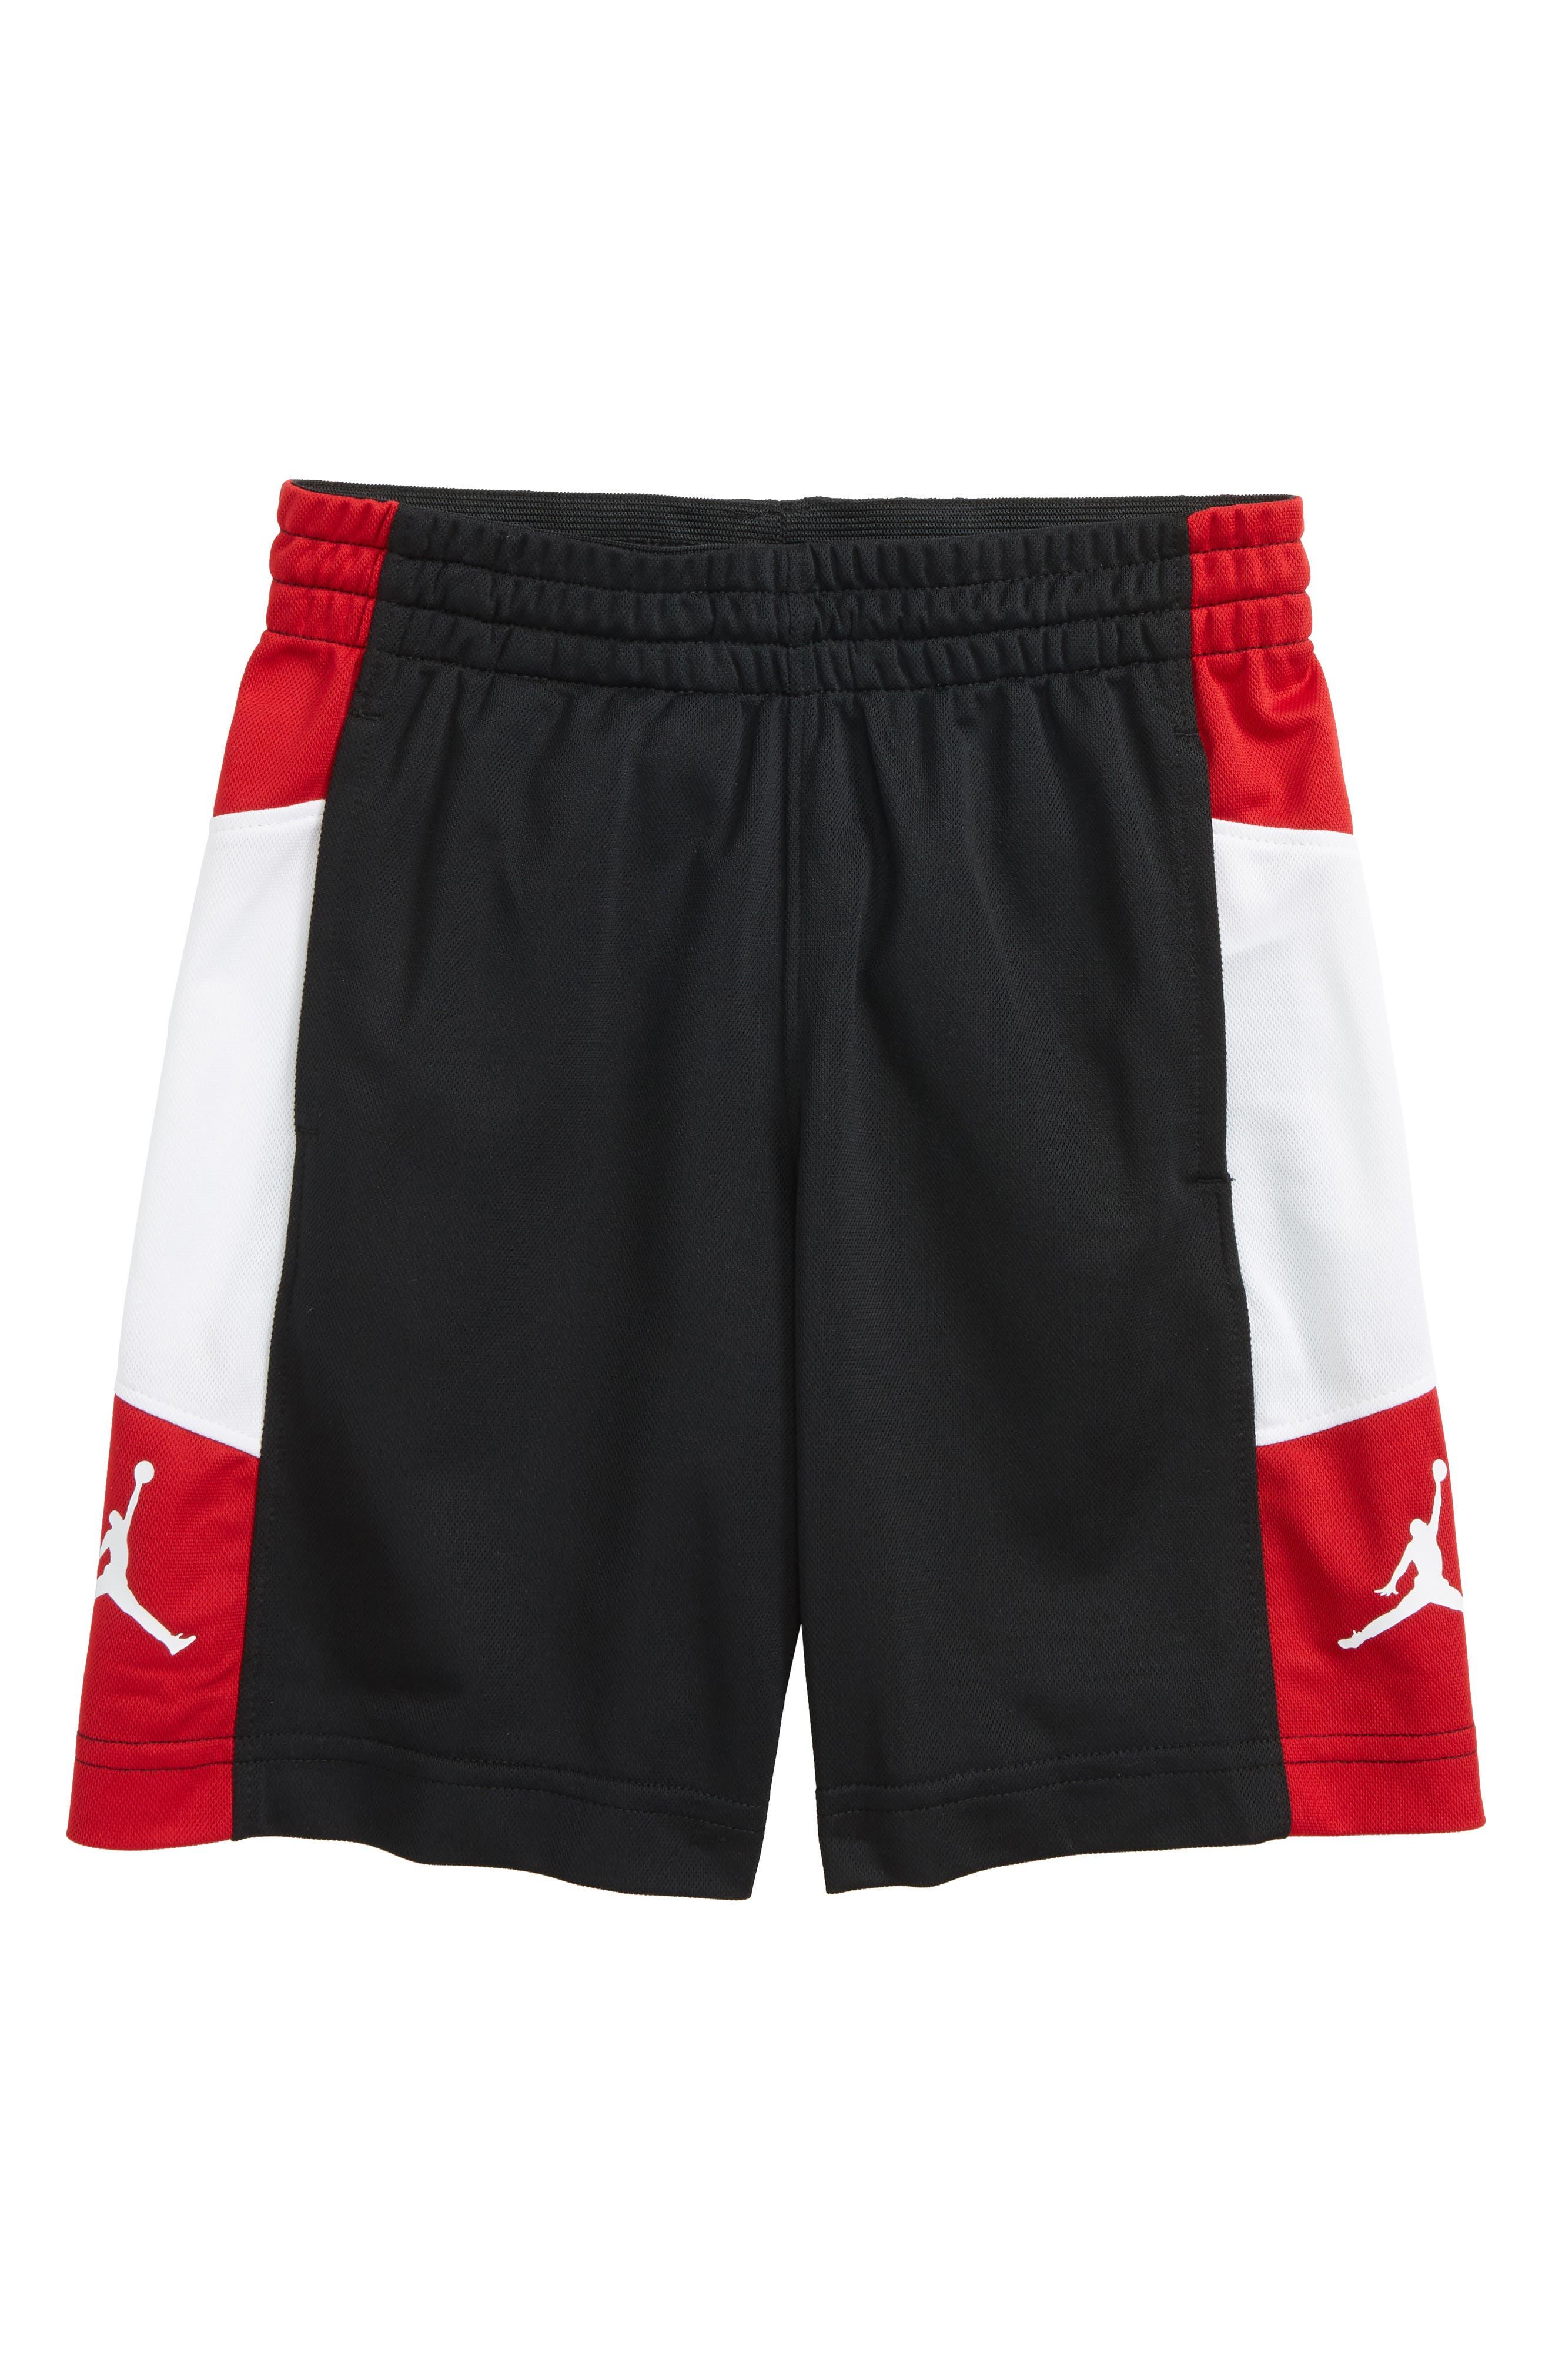 Jordan Rise Elevate Shorts,                             Main thumbnail 1, color,                             004